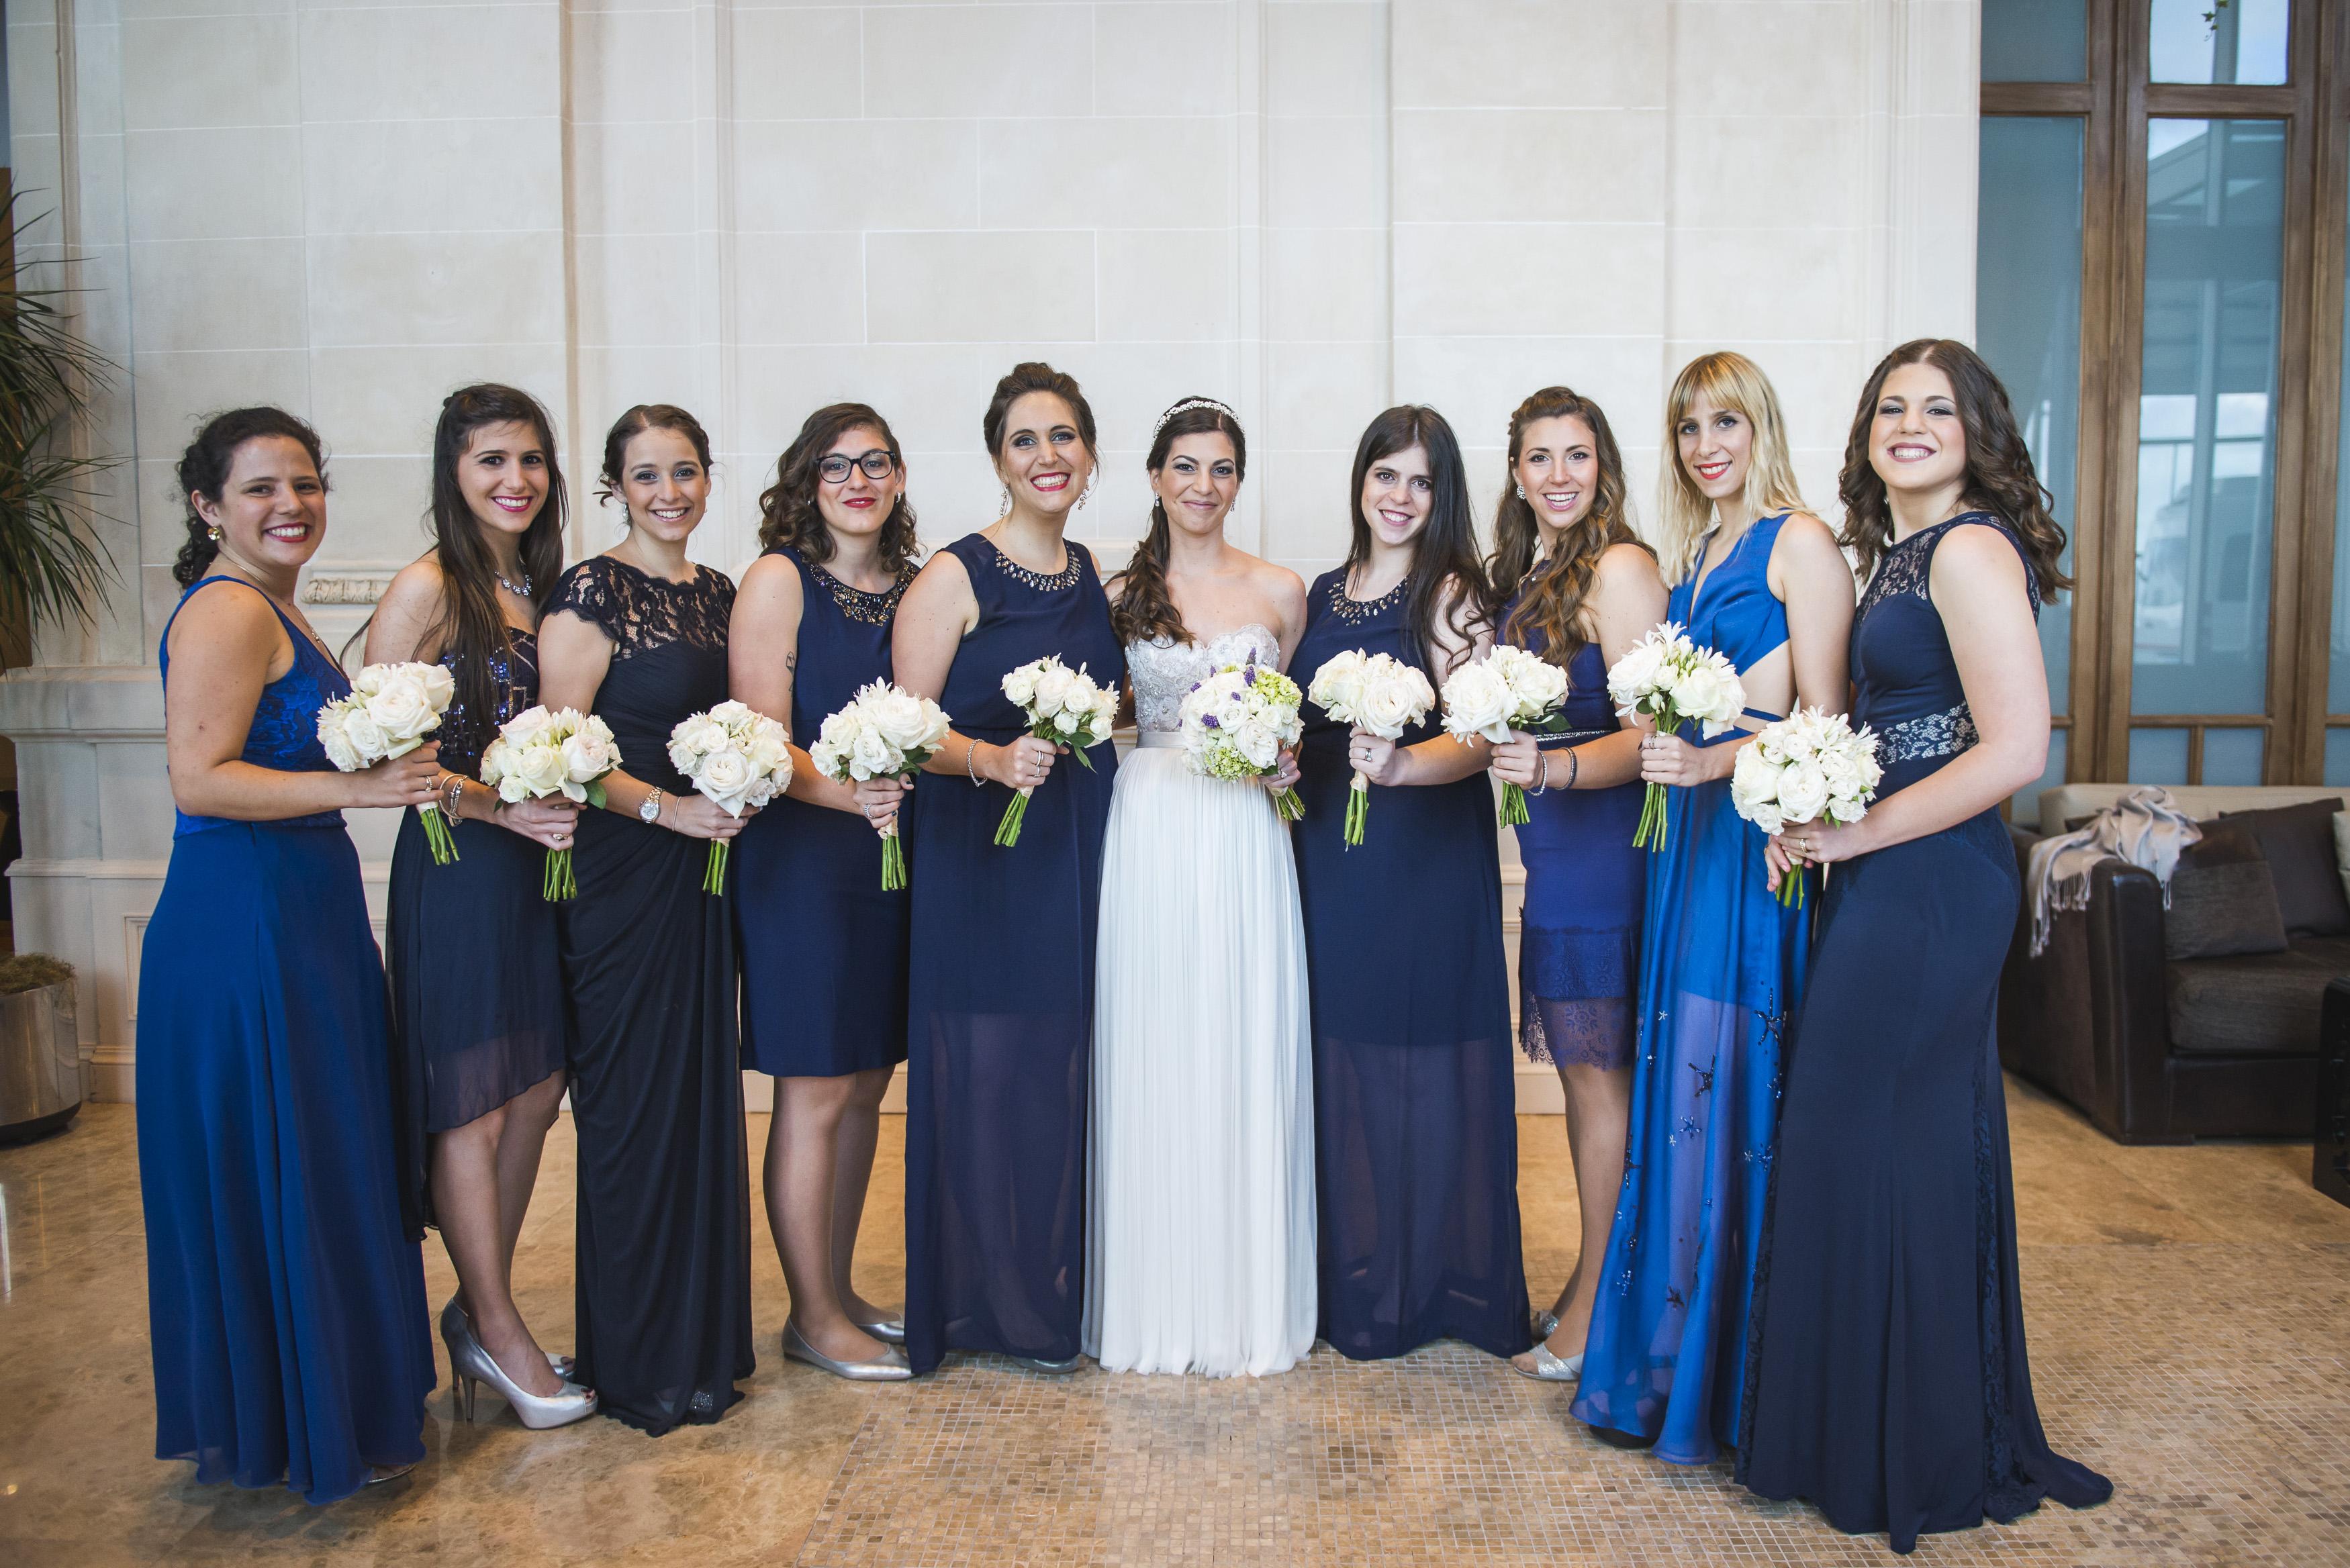 patricia-riba-boda-judia-uruguay-ionit-bryan-17